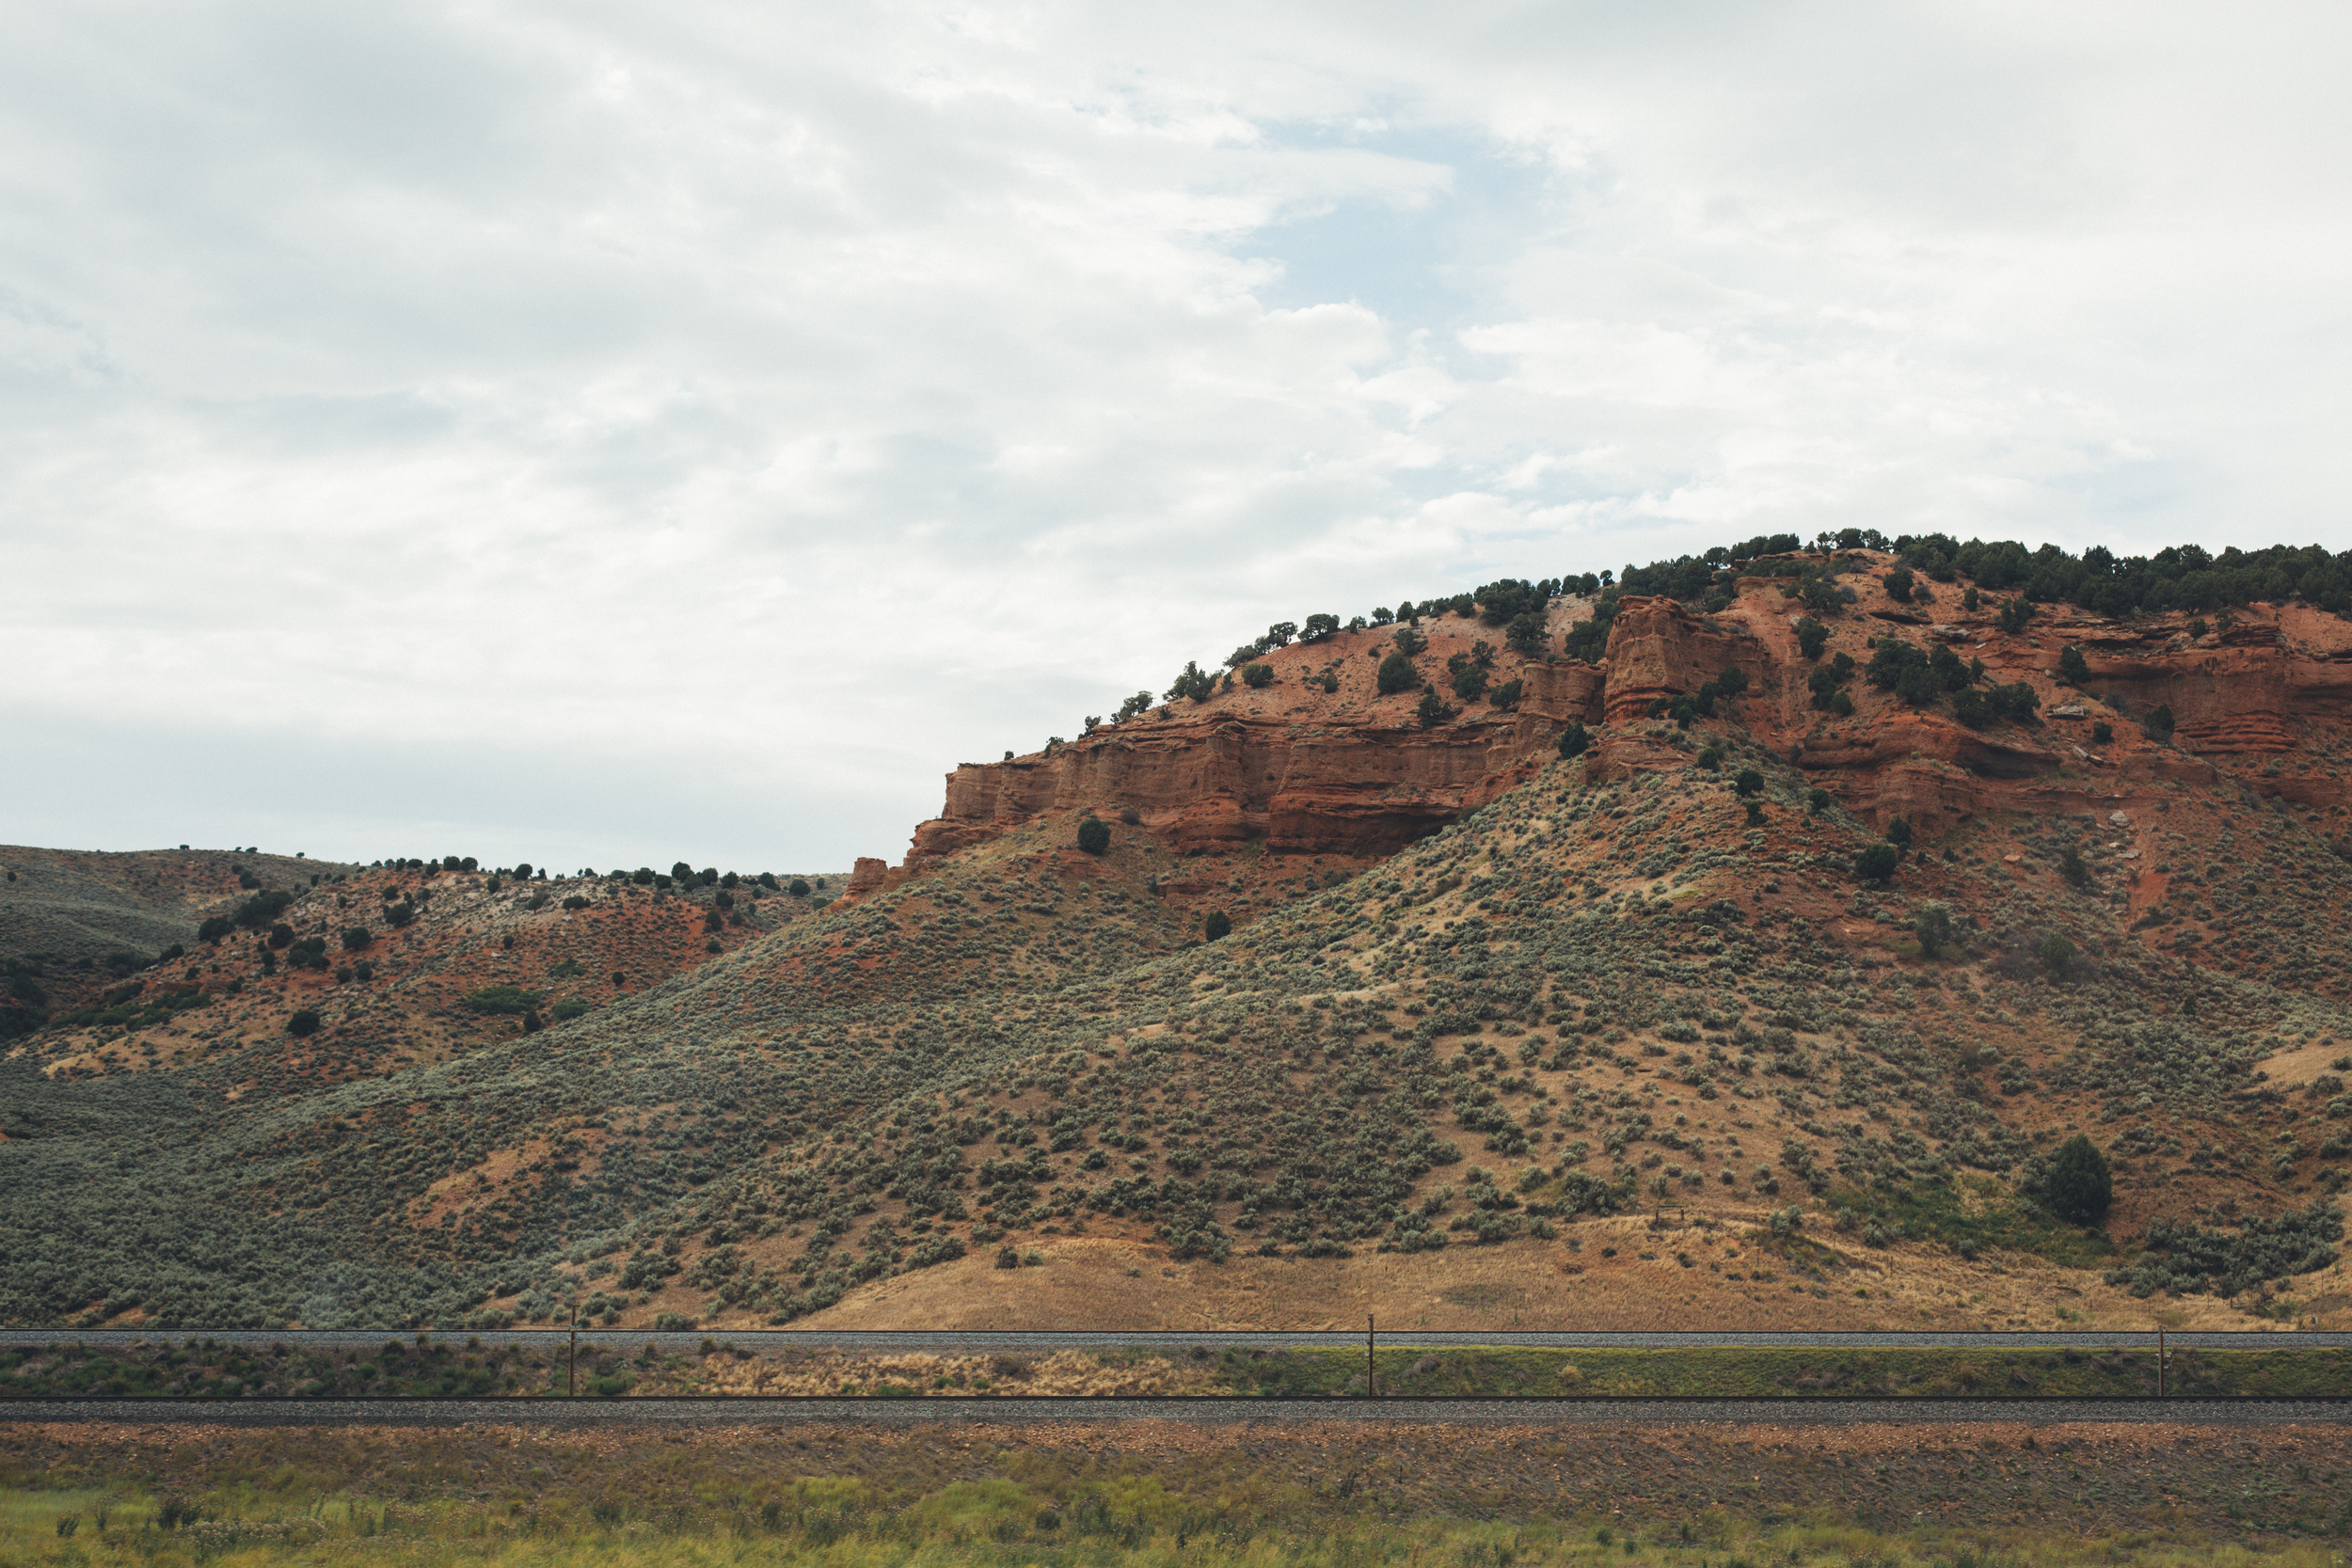 Wyoming Bluffs